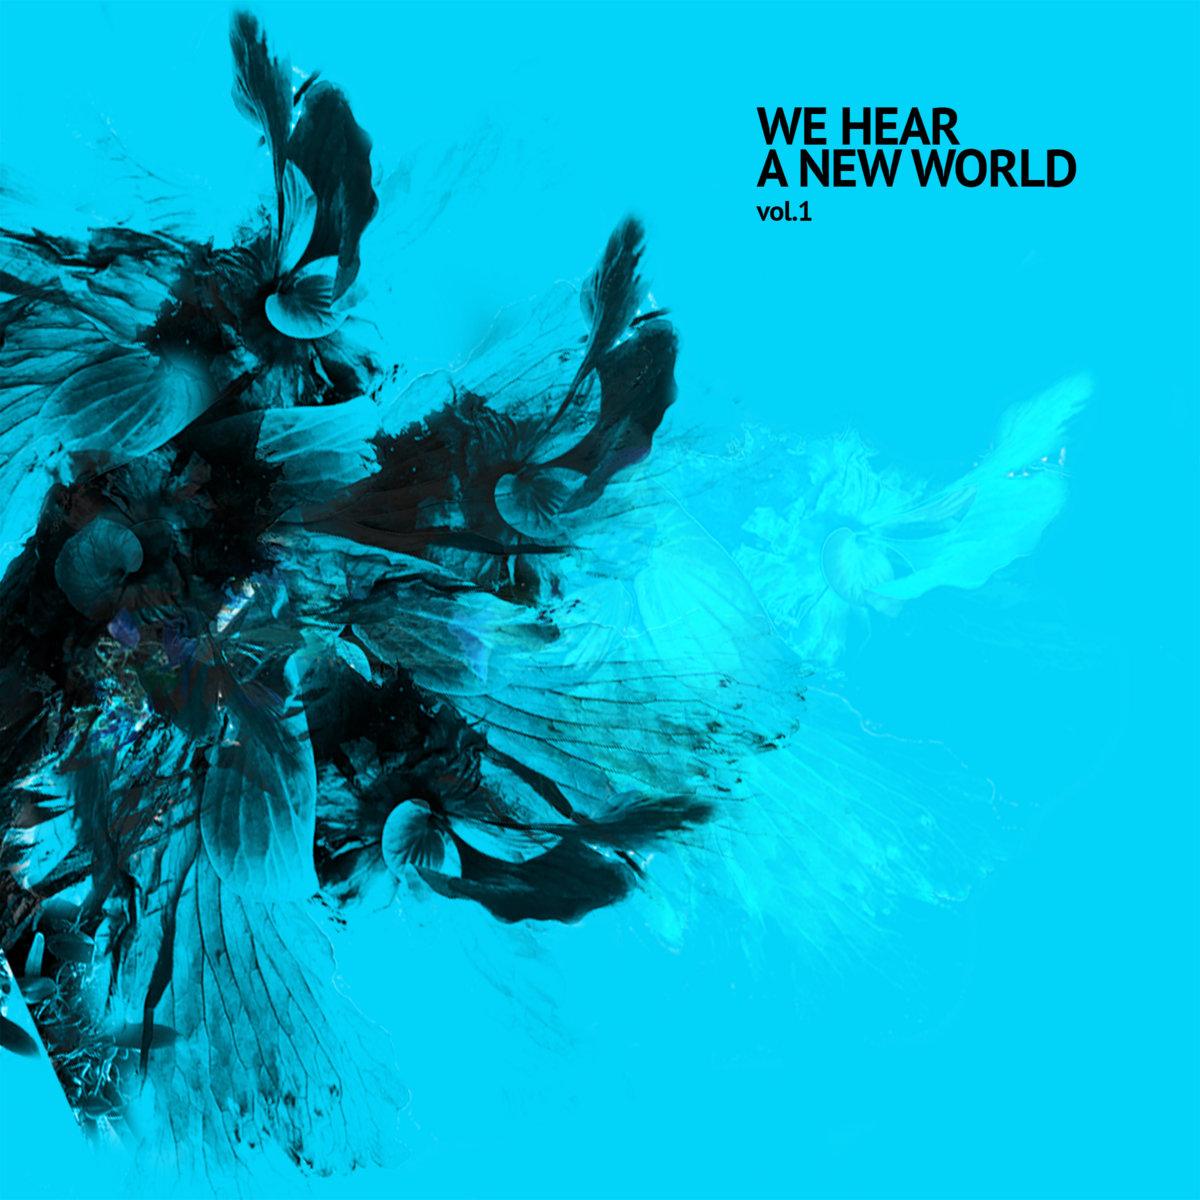 We Hear A New World Vol.1